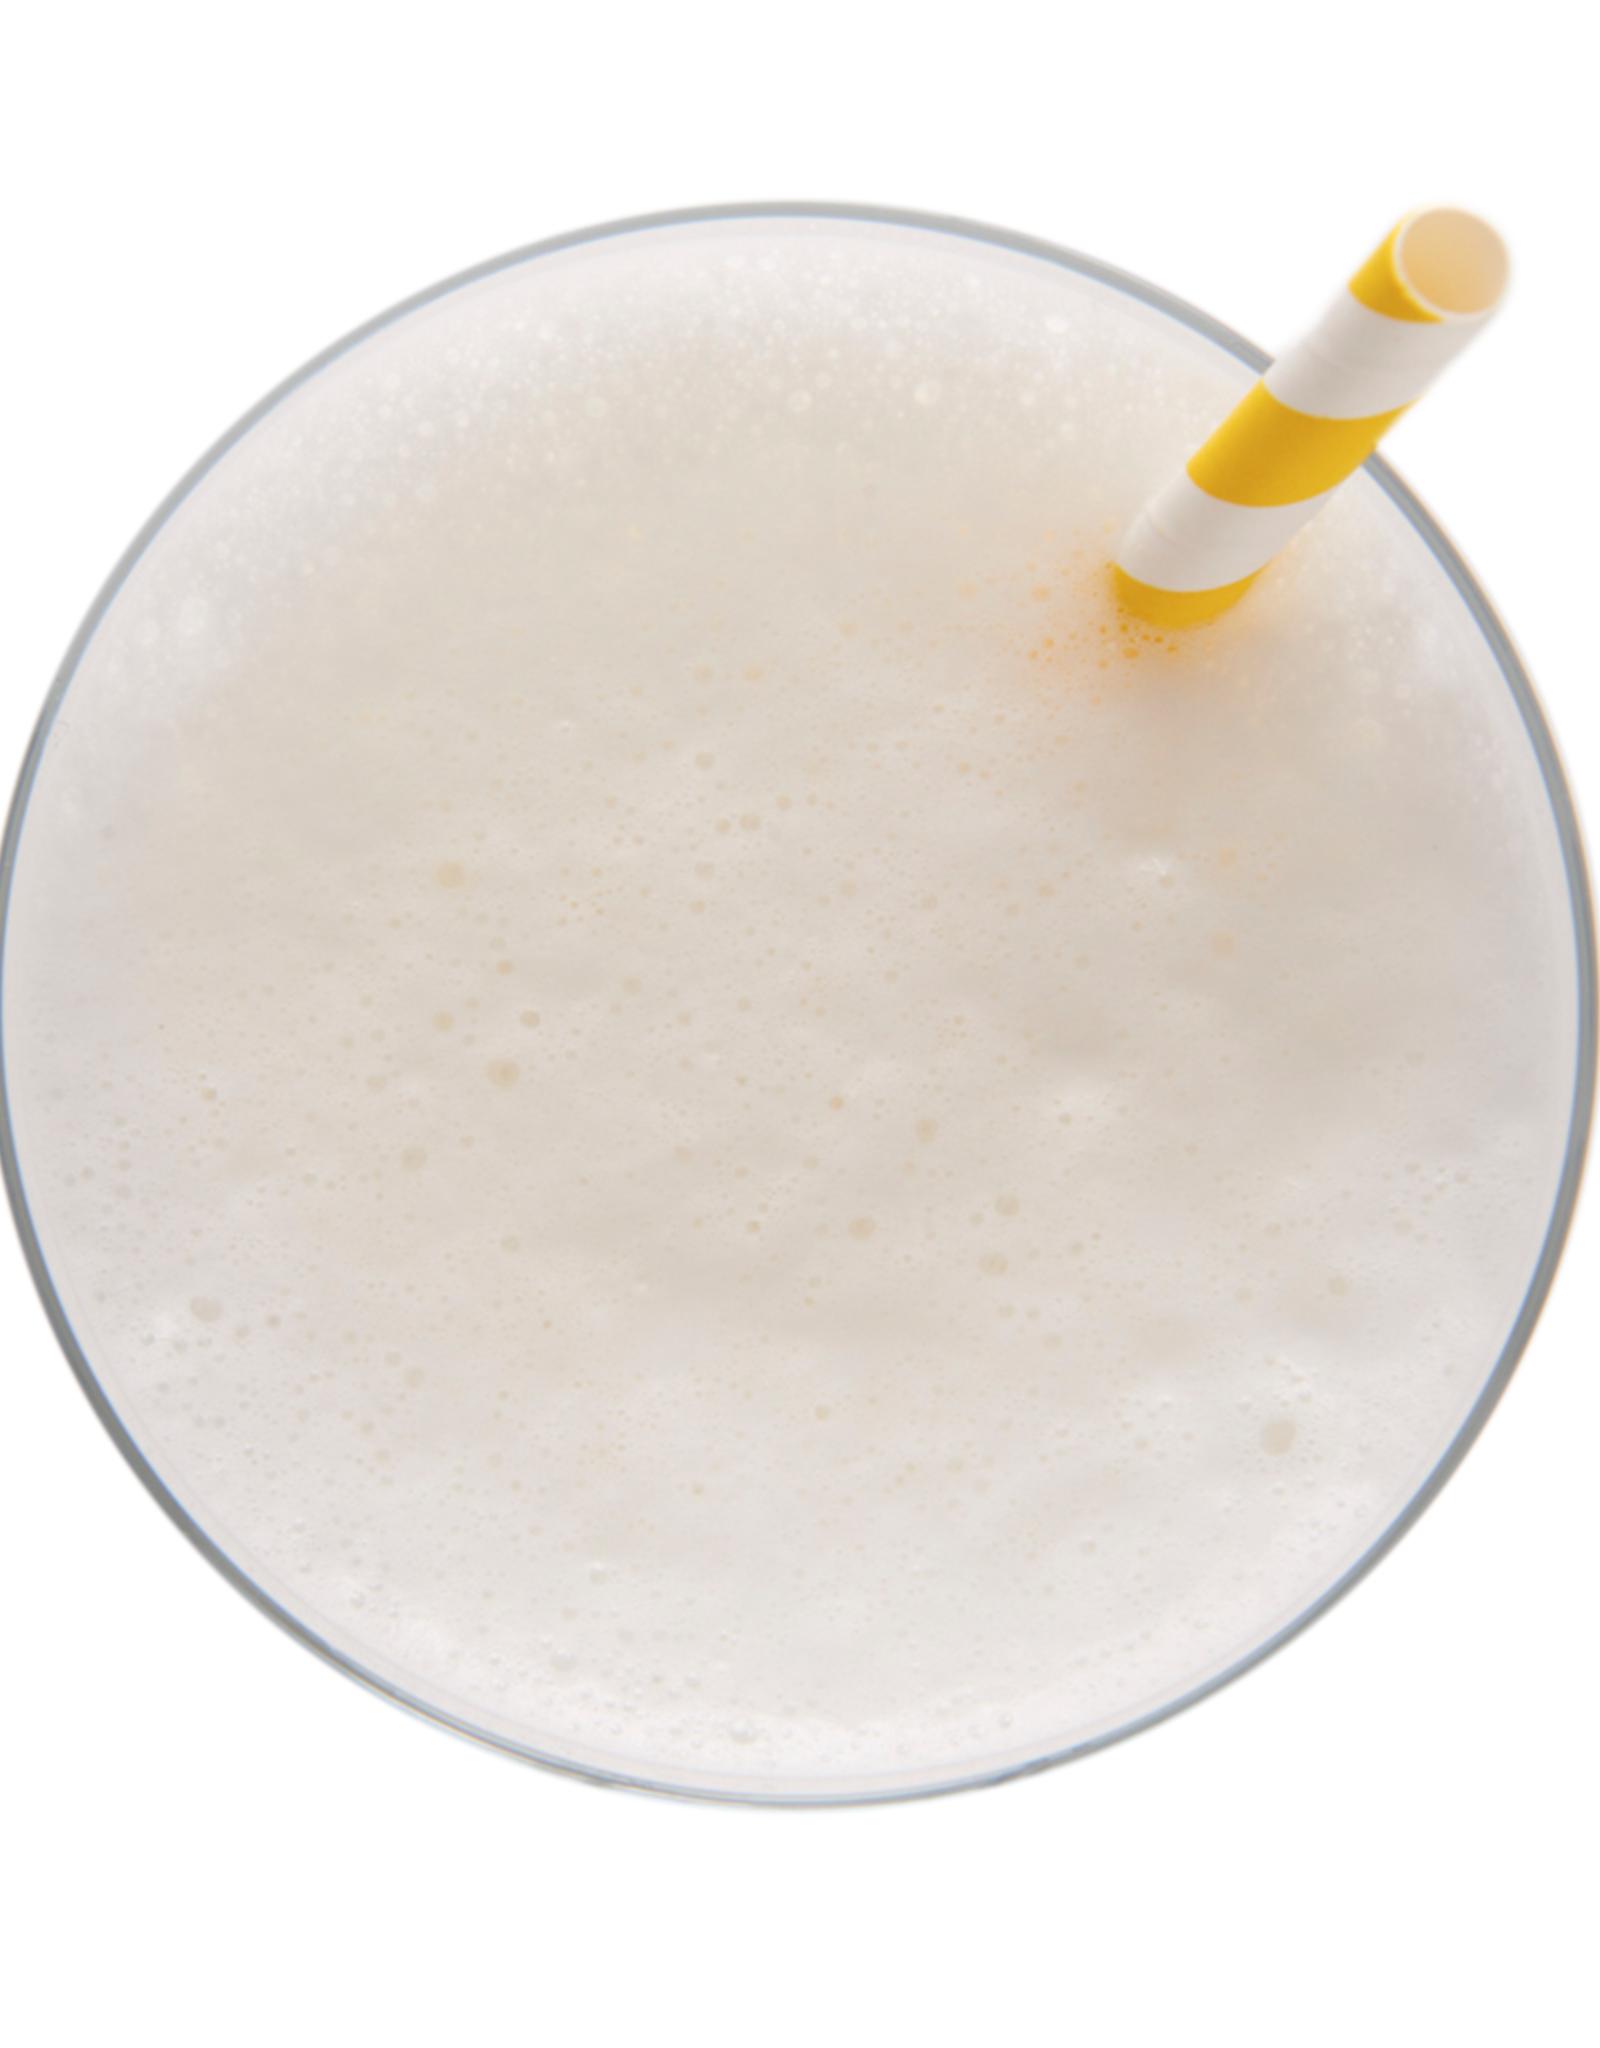 Ideal Protein Pina Colada Smoothie Mix